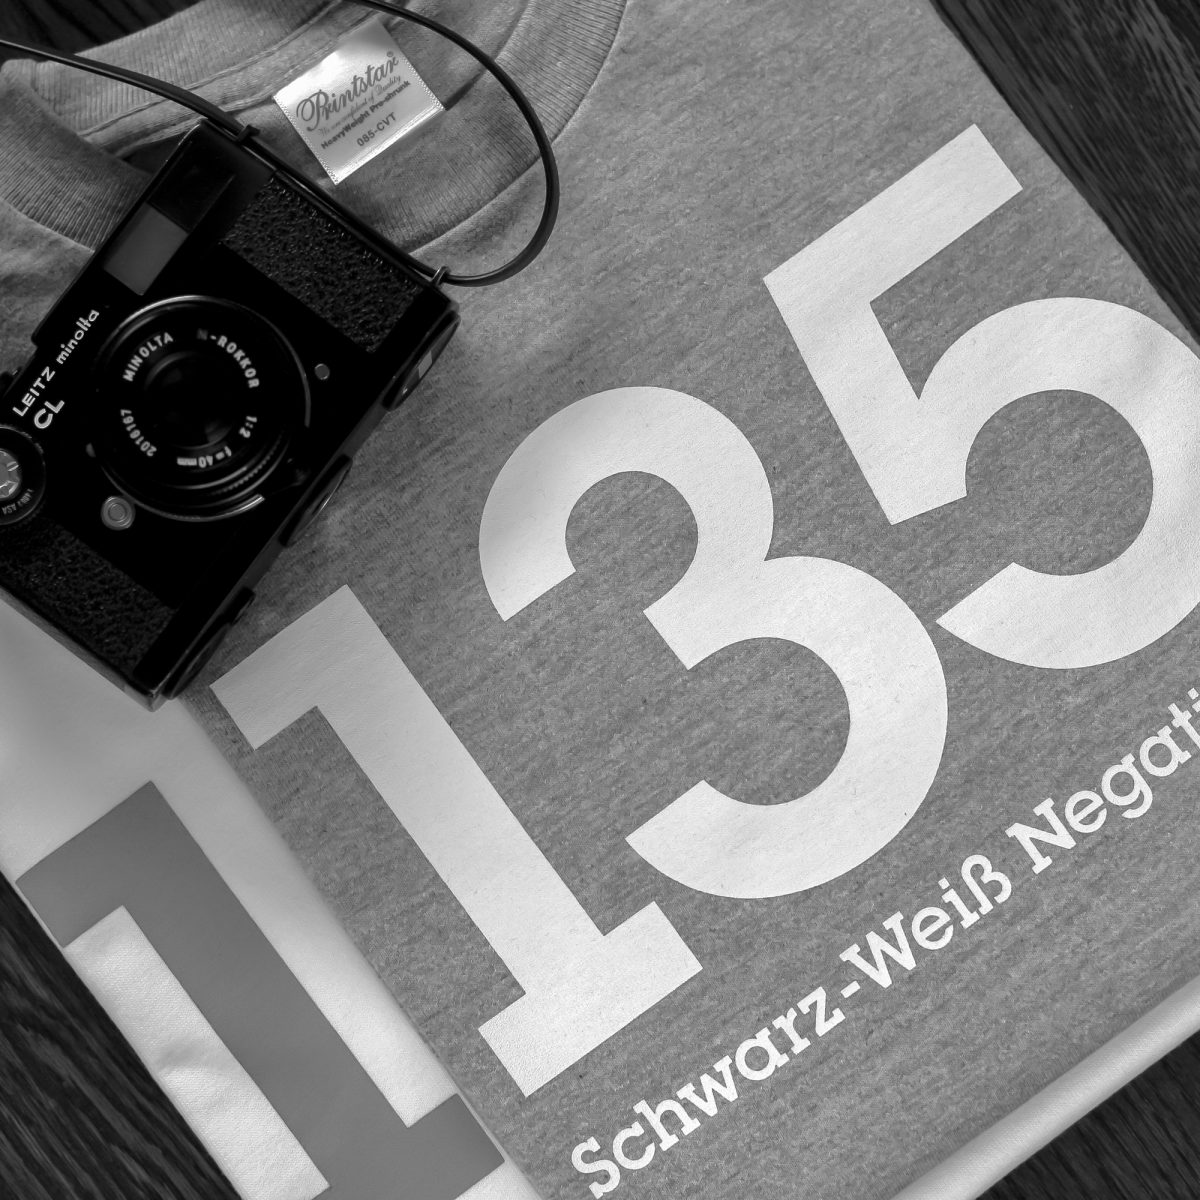 135 Schwarz-Weiß Negativfilm|カメラ Tシャツ|グラフィックデザイン